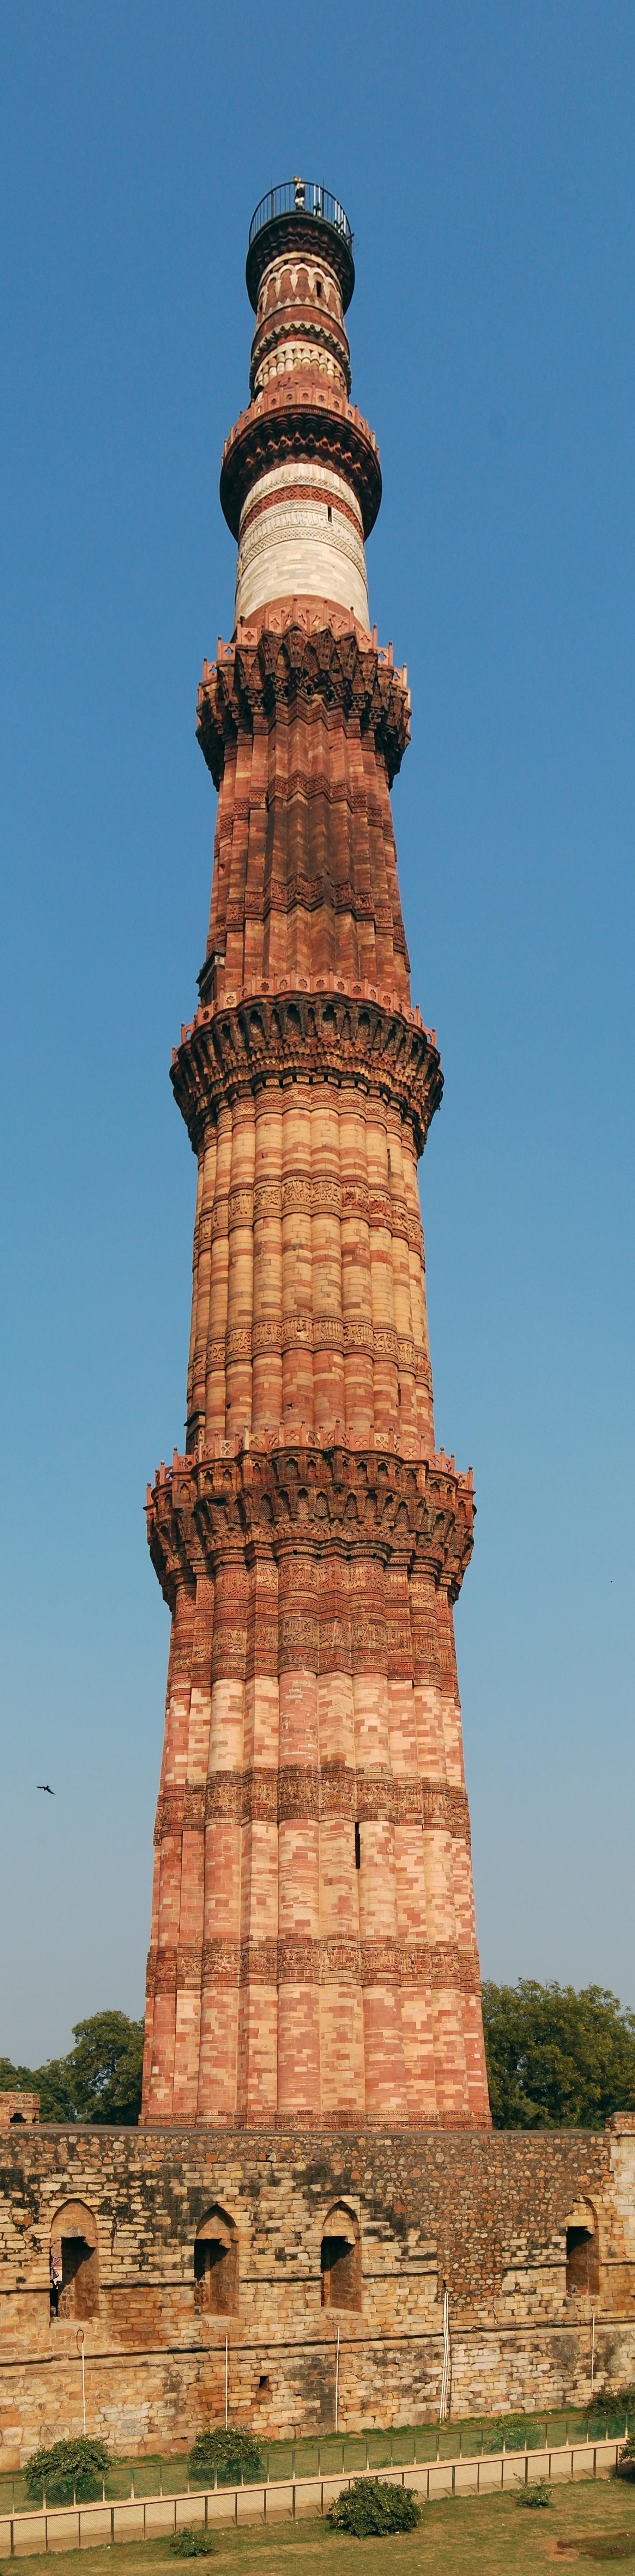 File:Qutb Minar 2011.jpg - Qutub Minar PNG